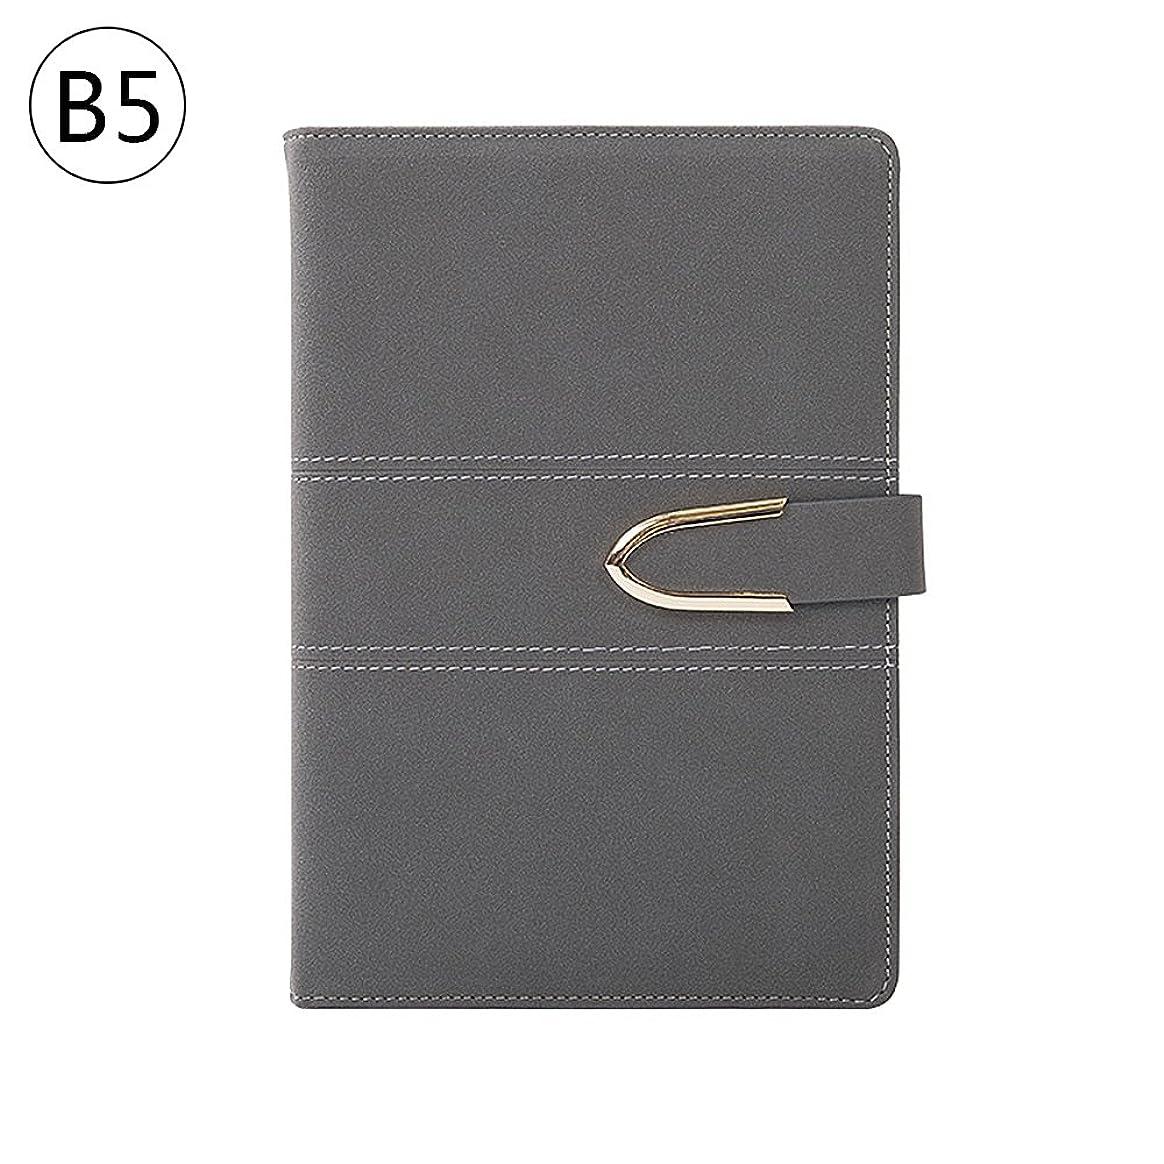 Zhi Jin 1冊 B5レザーノートビジネス手帳オフィス用 暗灰色